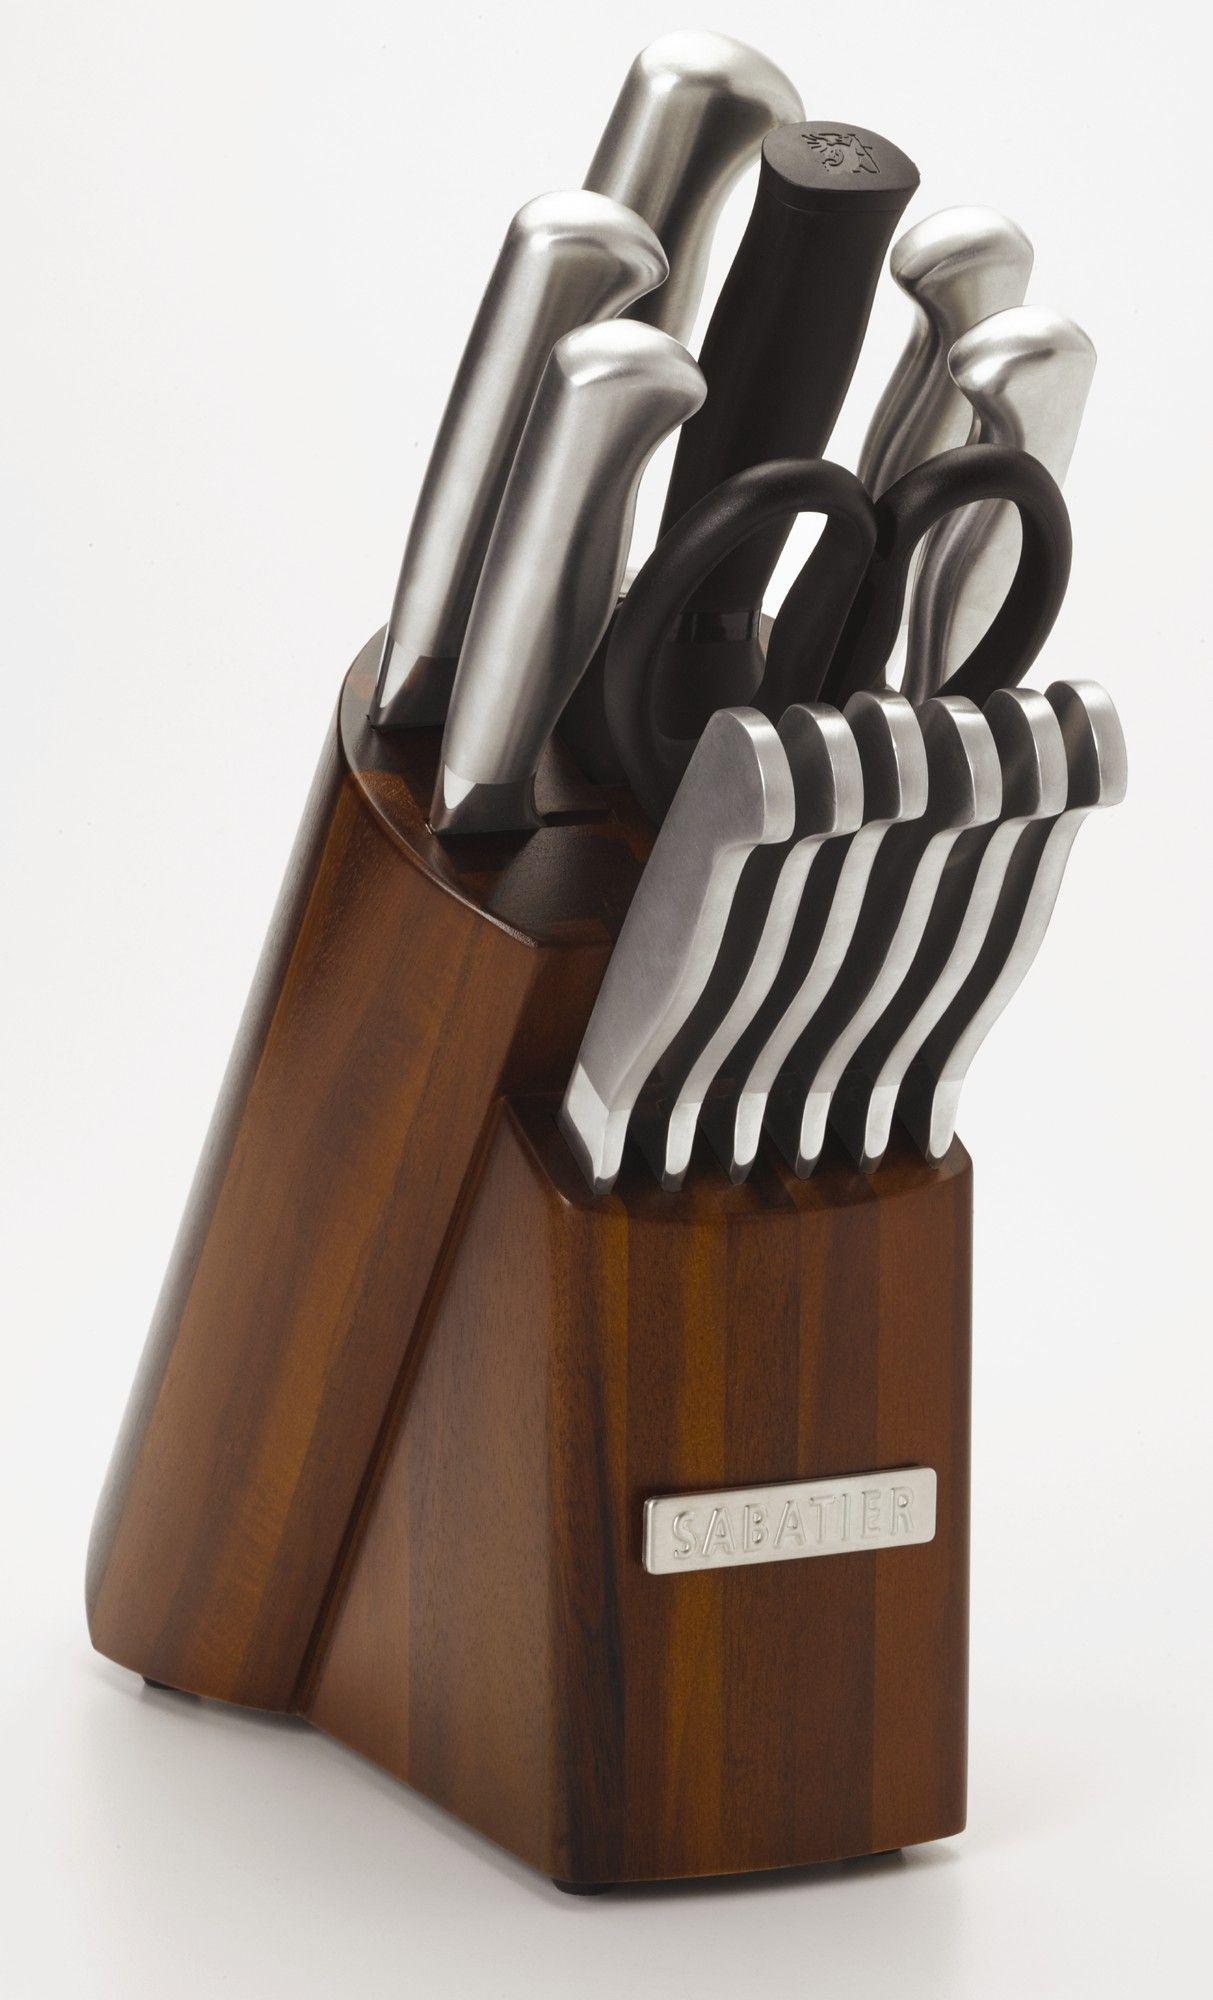 Piece Hollow Handle Knife Block Set Utility knife Steak knives